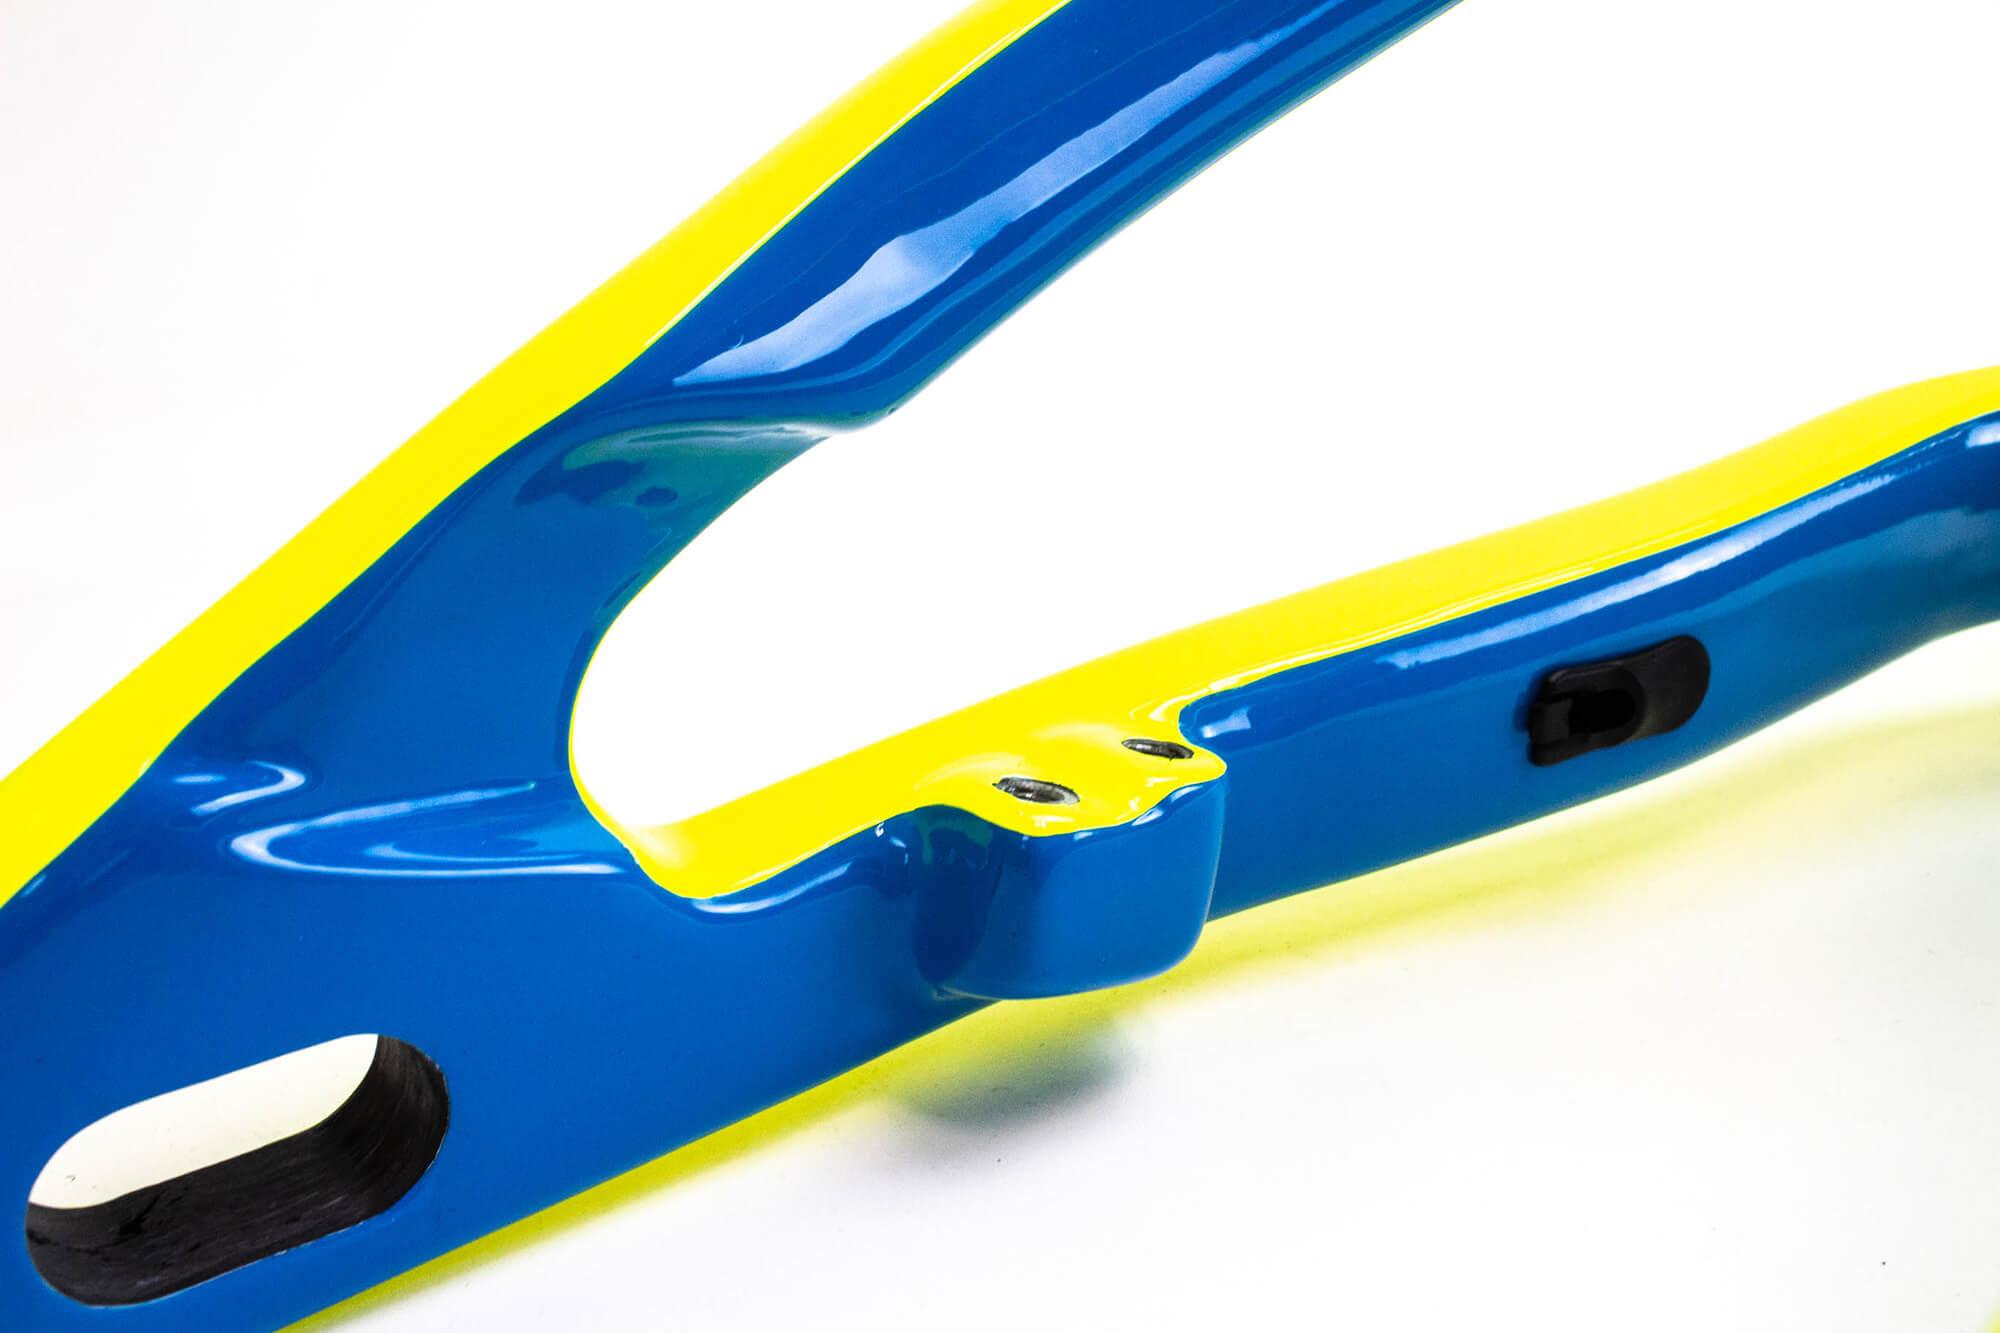 Supercross BMX Vision F1 - 06